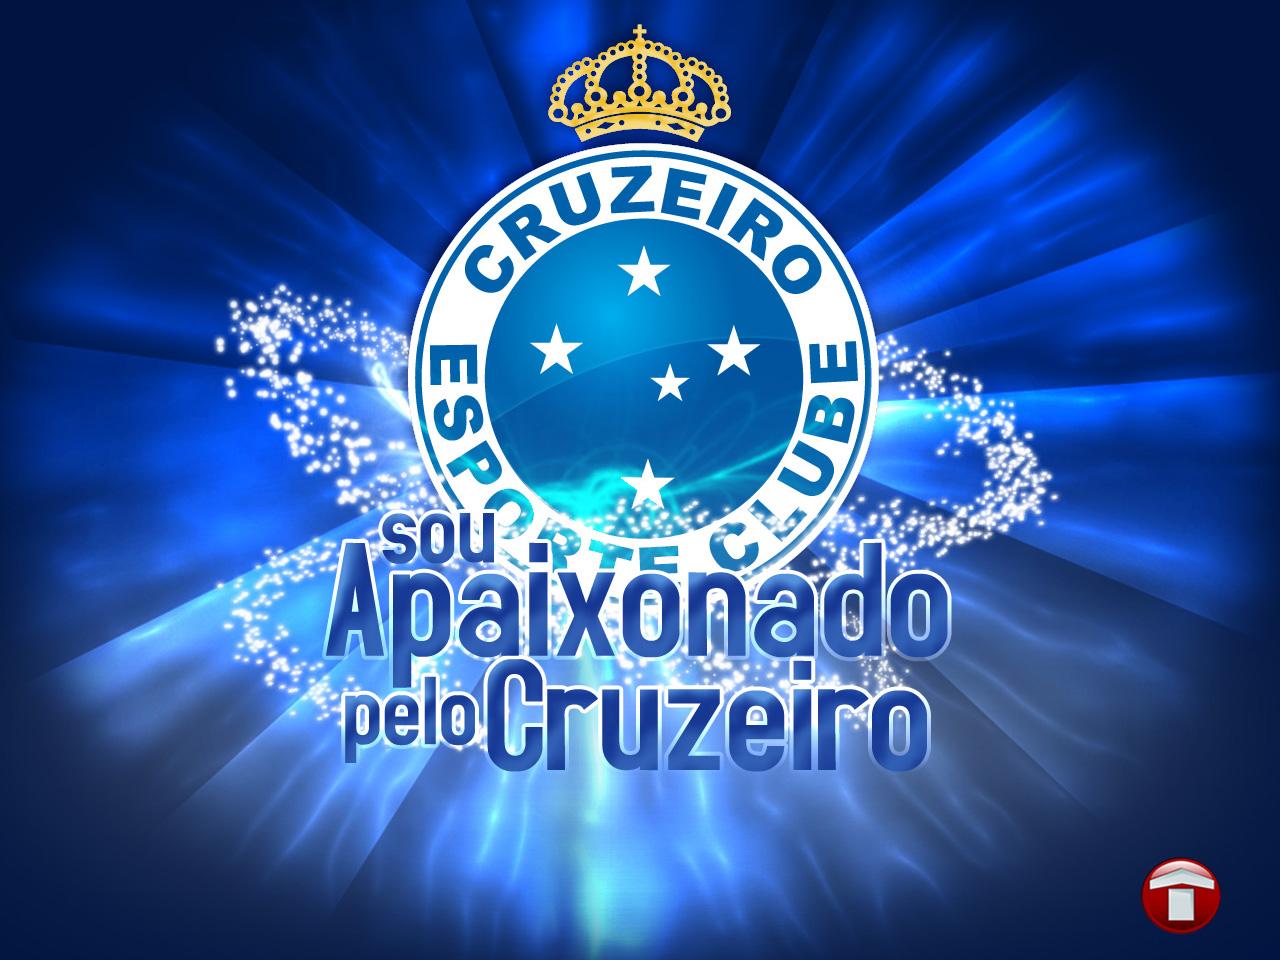 Cruzeiro Football Wallpaper 1280x960